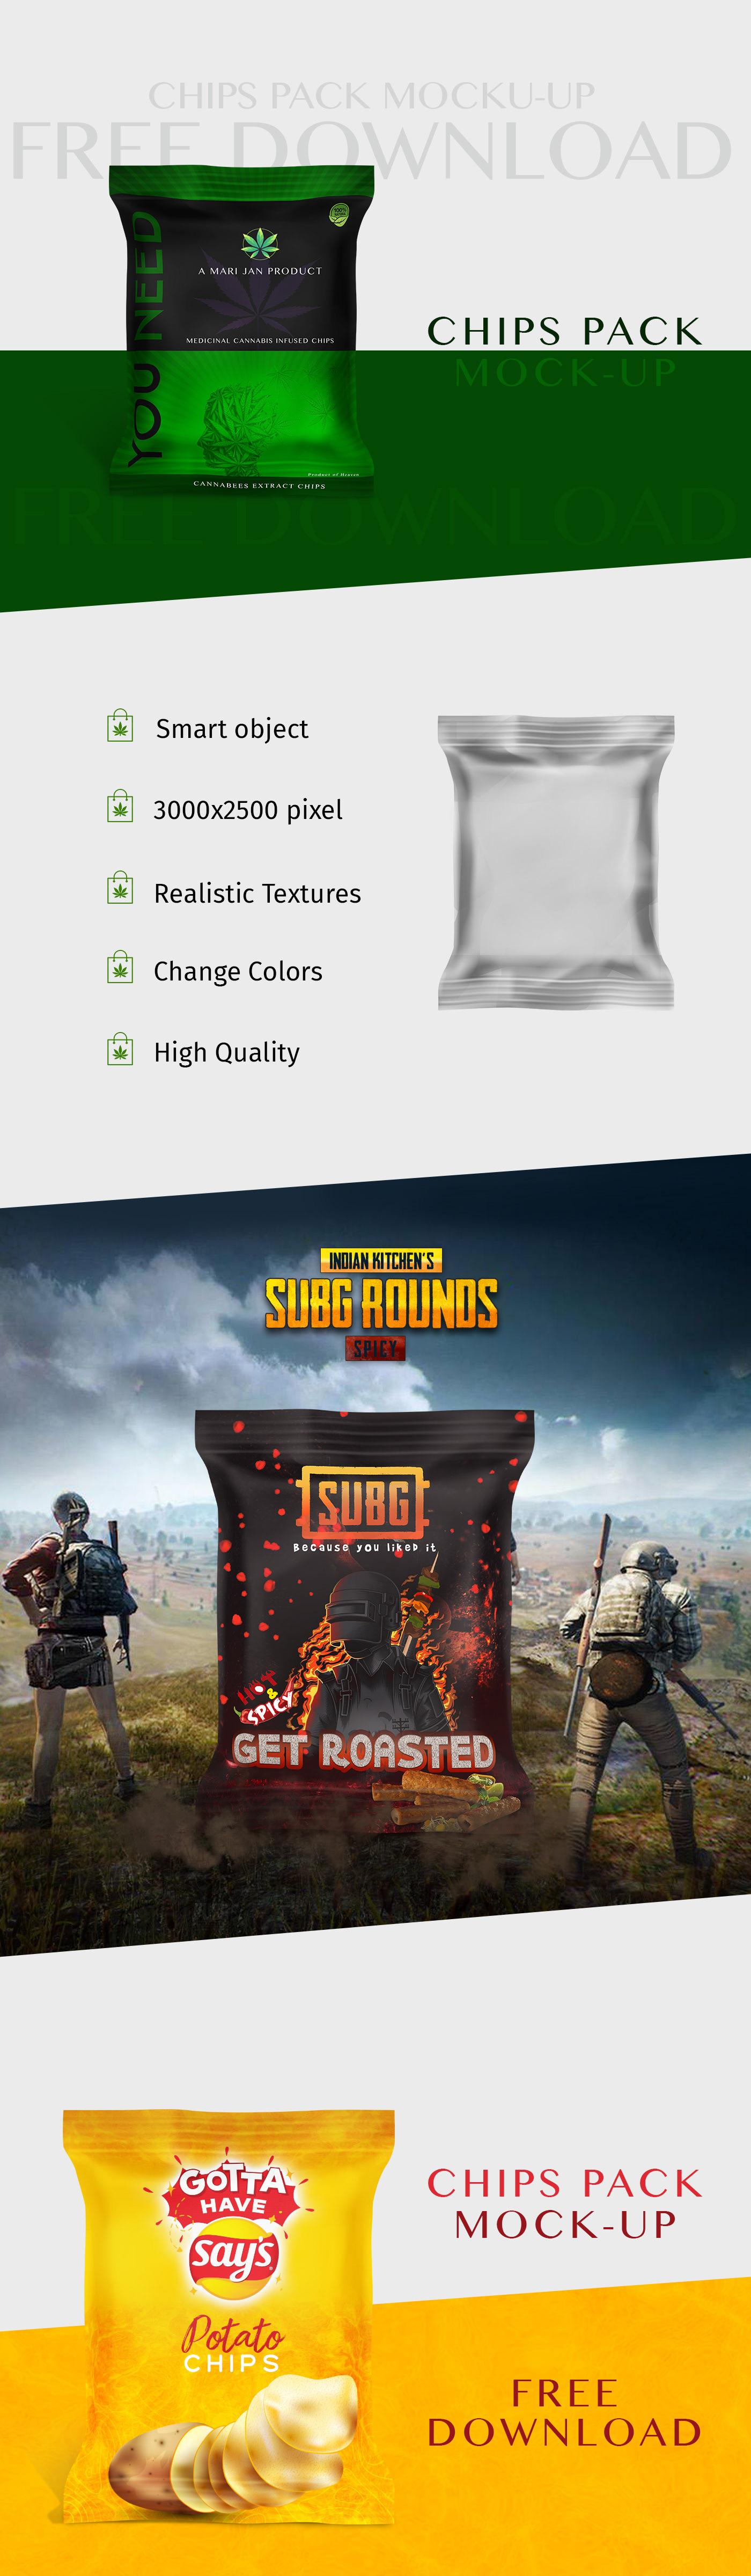 branding  Chips Pack free download free mockup  freelancer Mockup Packaging satheeshlive